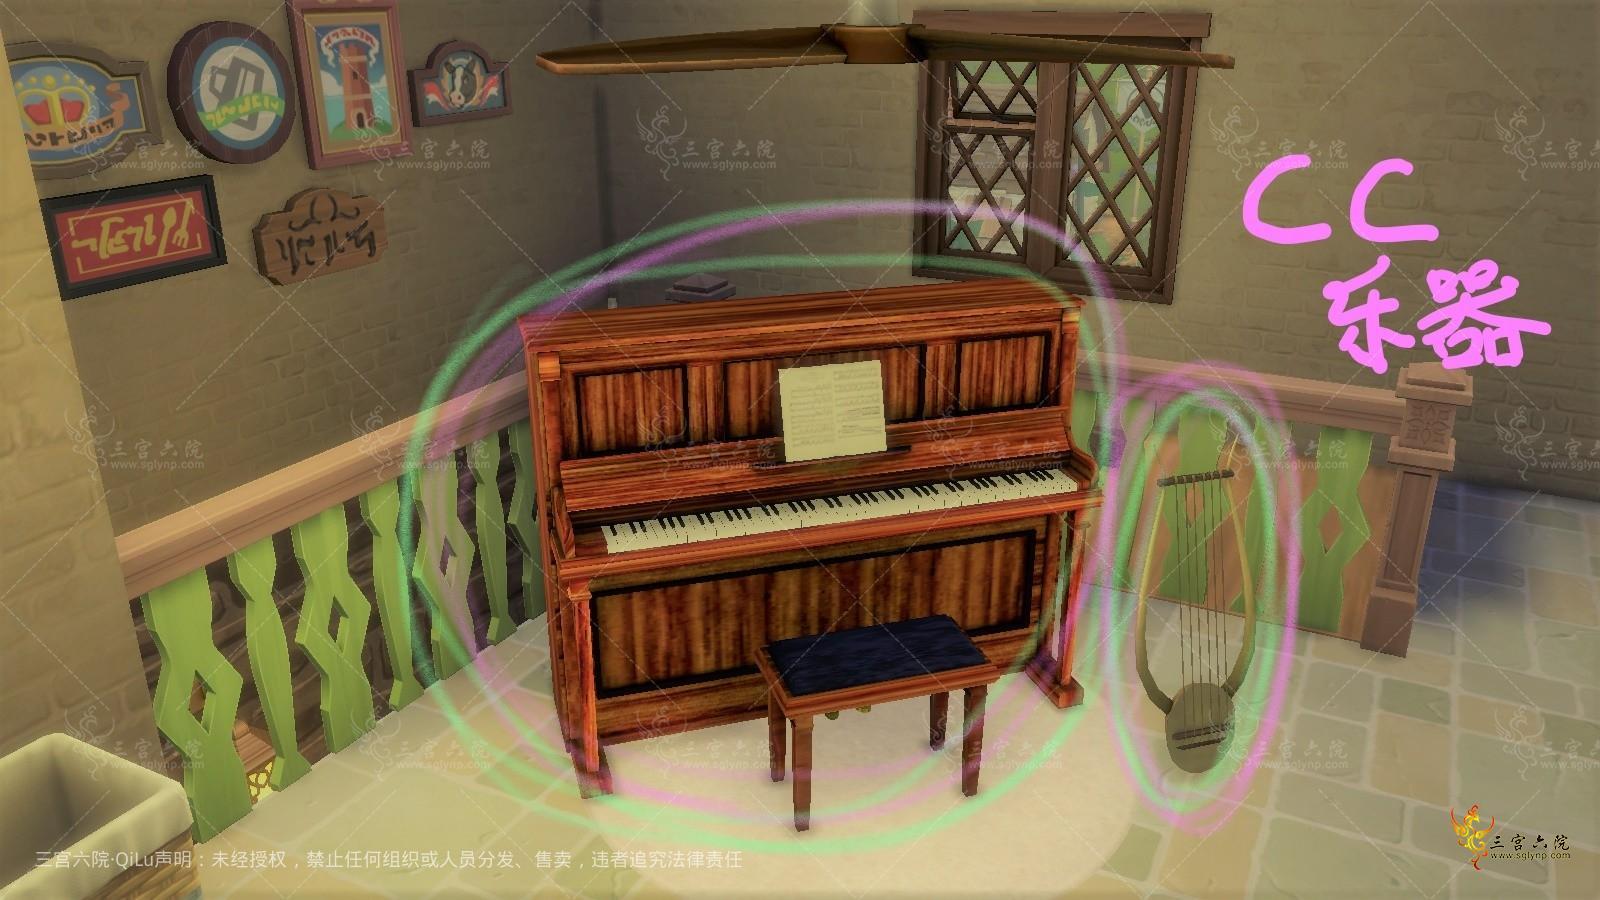 InkedThe Sims 4 2021_8_22 8_42_12_LI.jpg